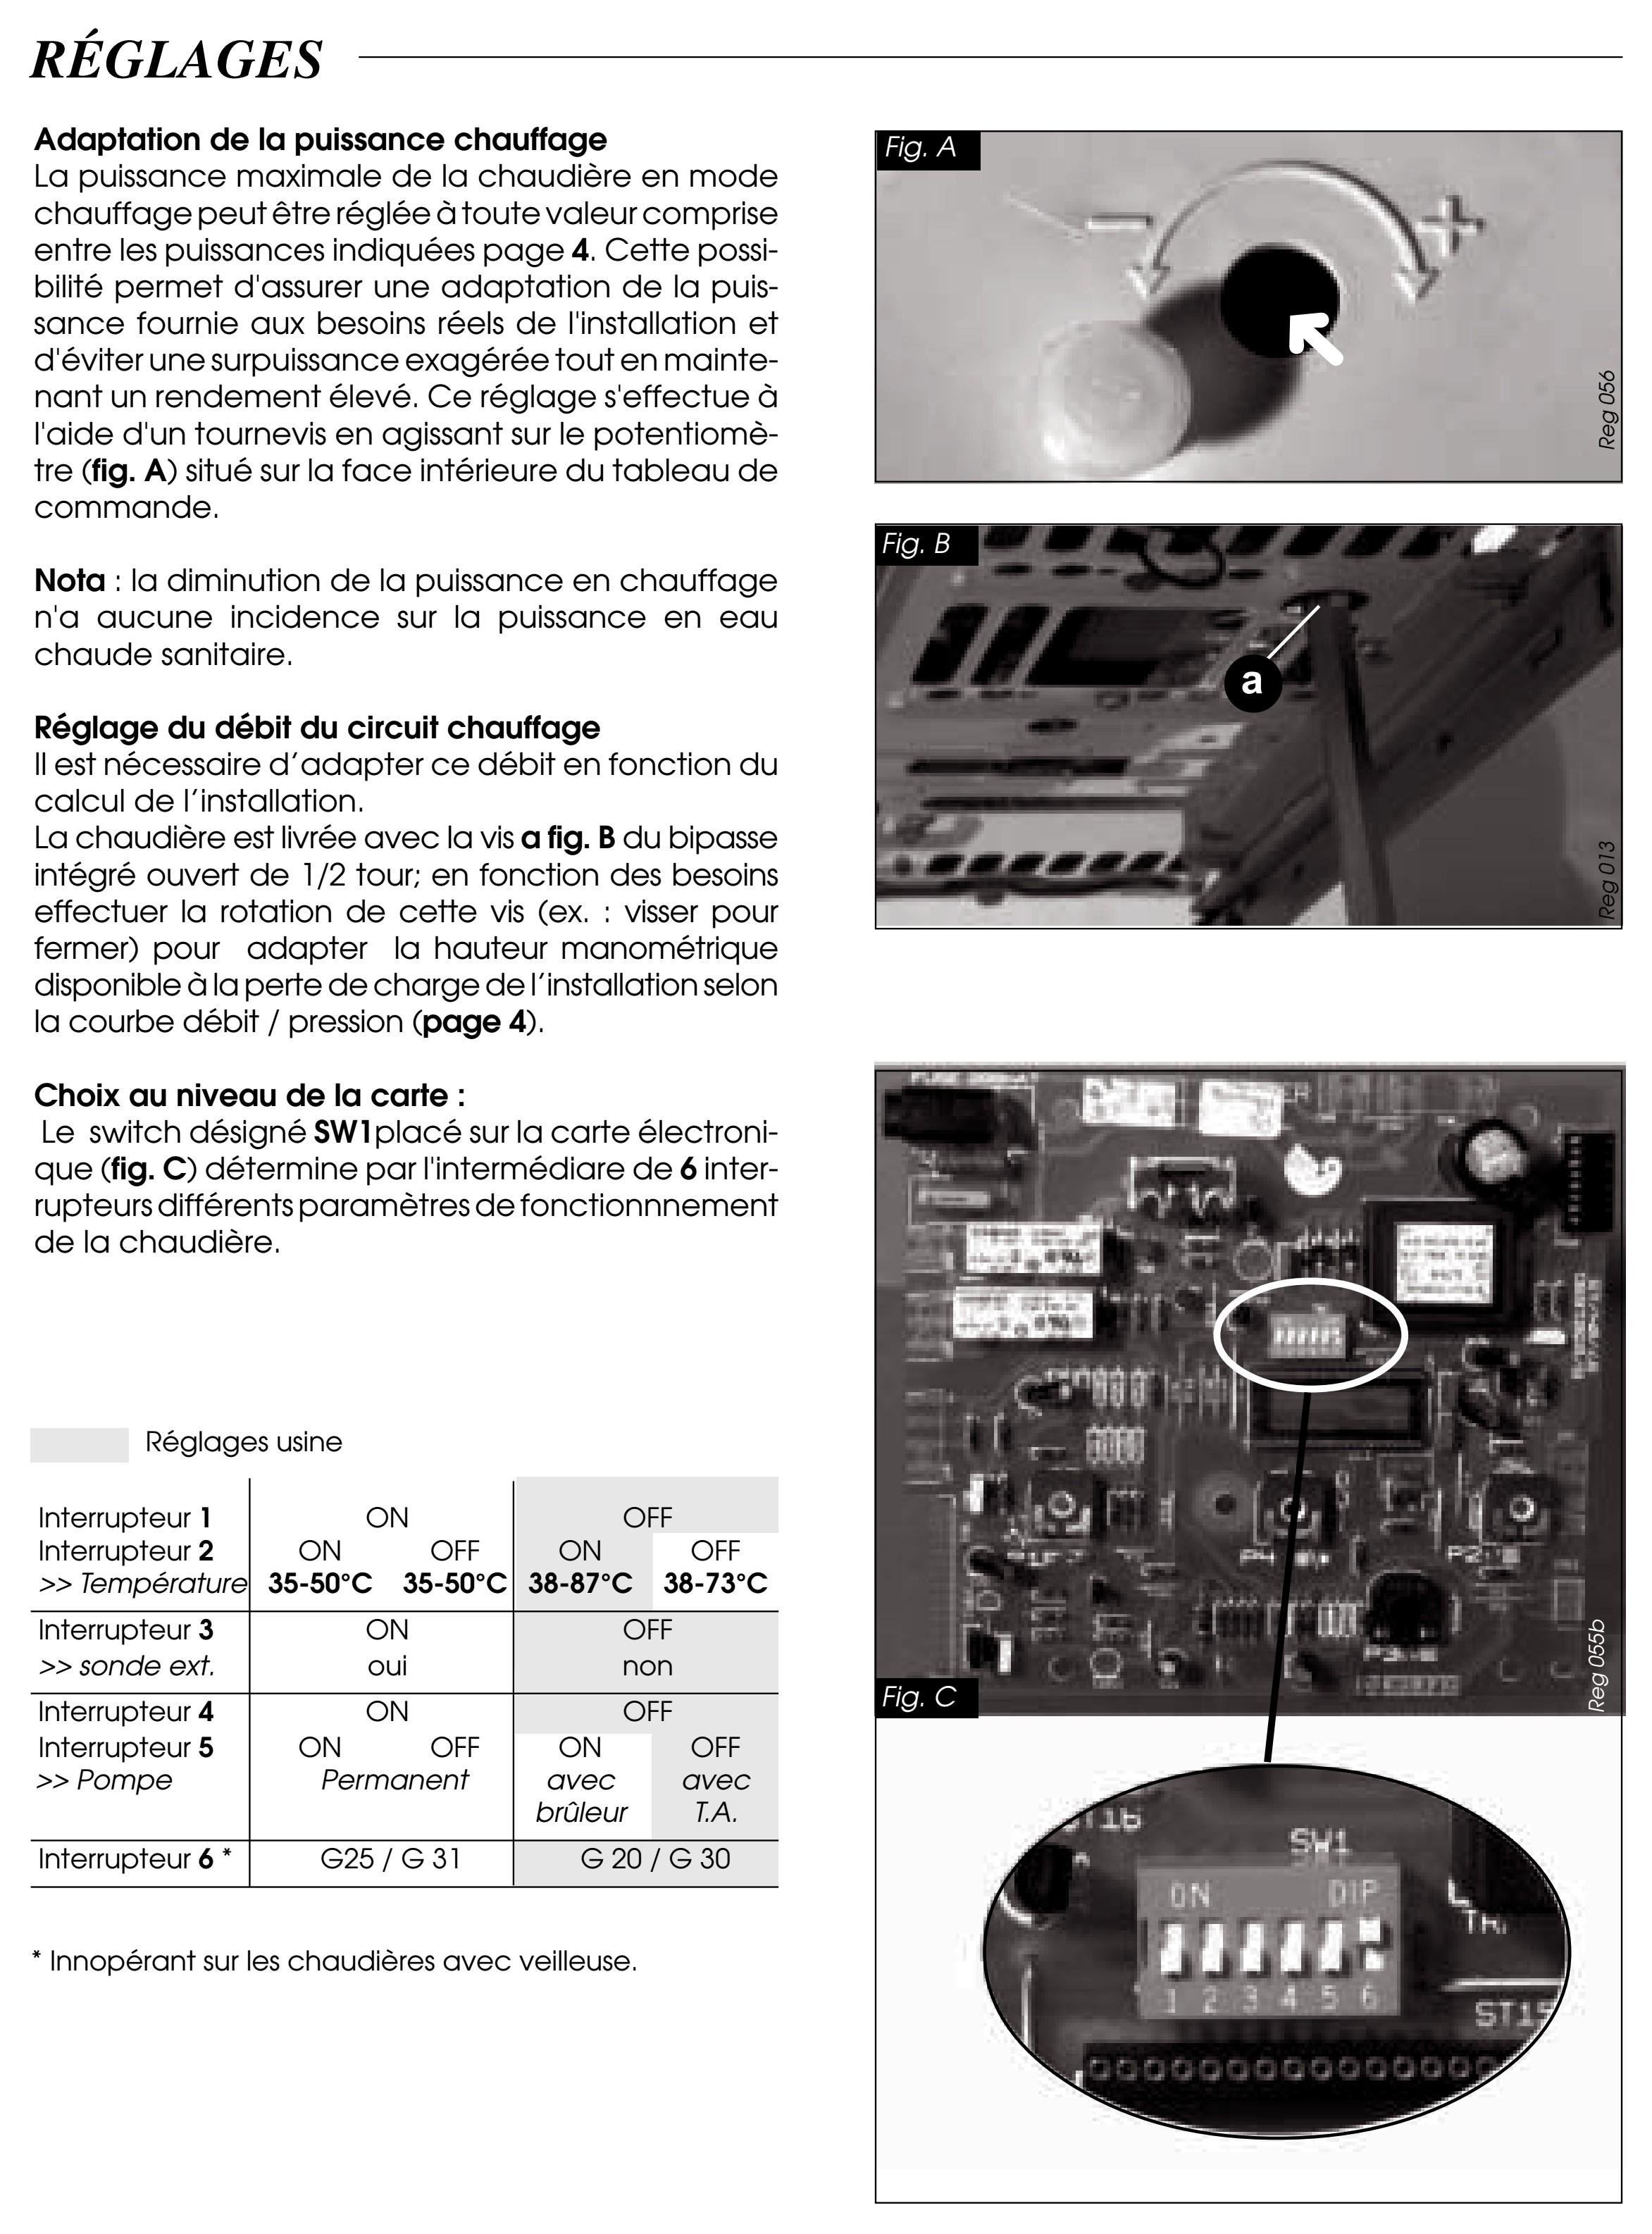 Thermostat Et Chaudiere Gaz Saunier Duval Thema C23e Page 1 Regulations Et Thermostats D Ambiance Plombiers Reunis